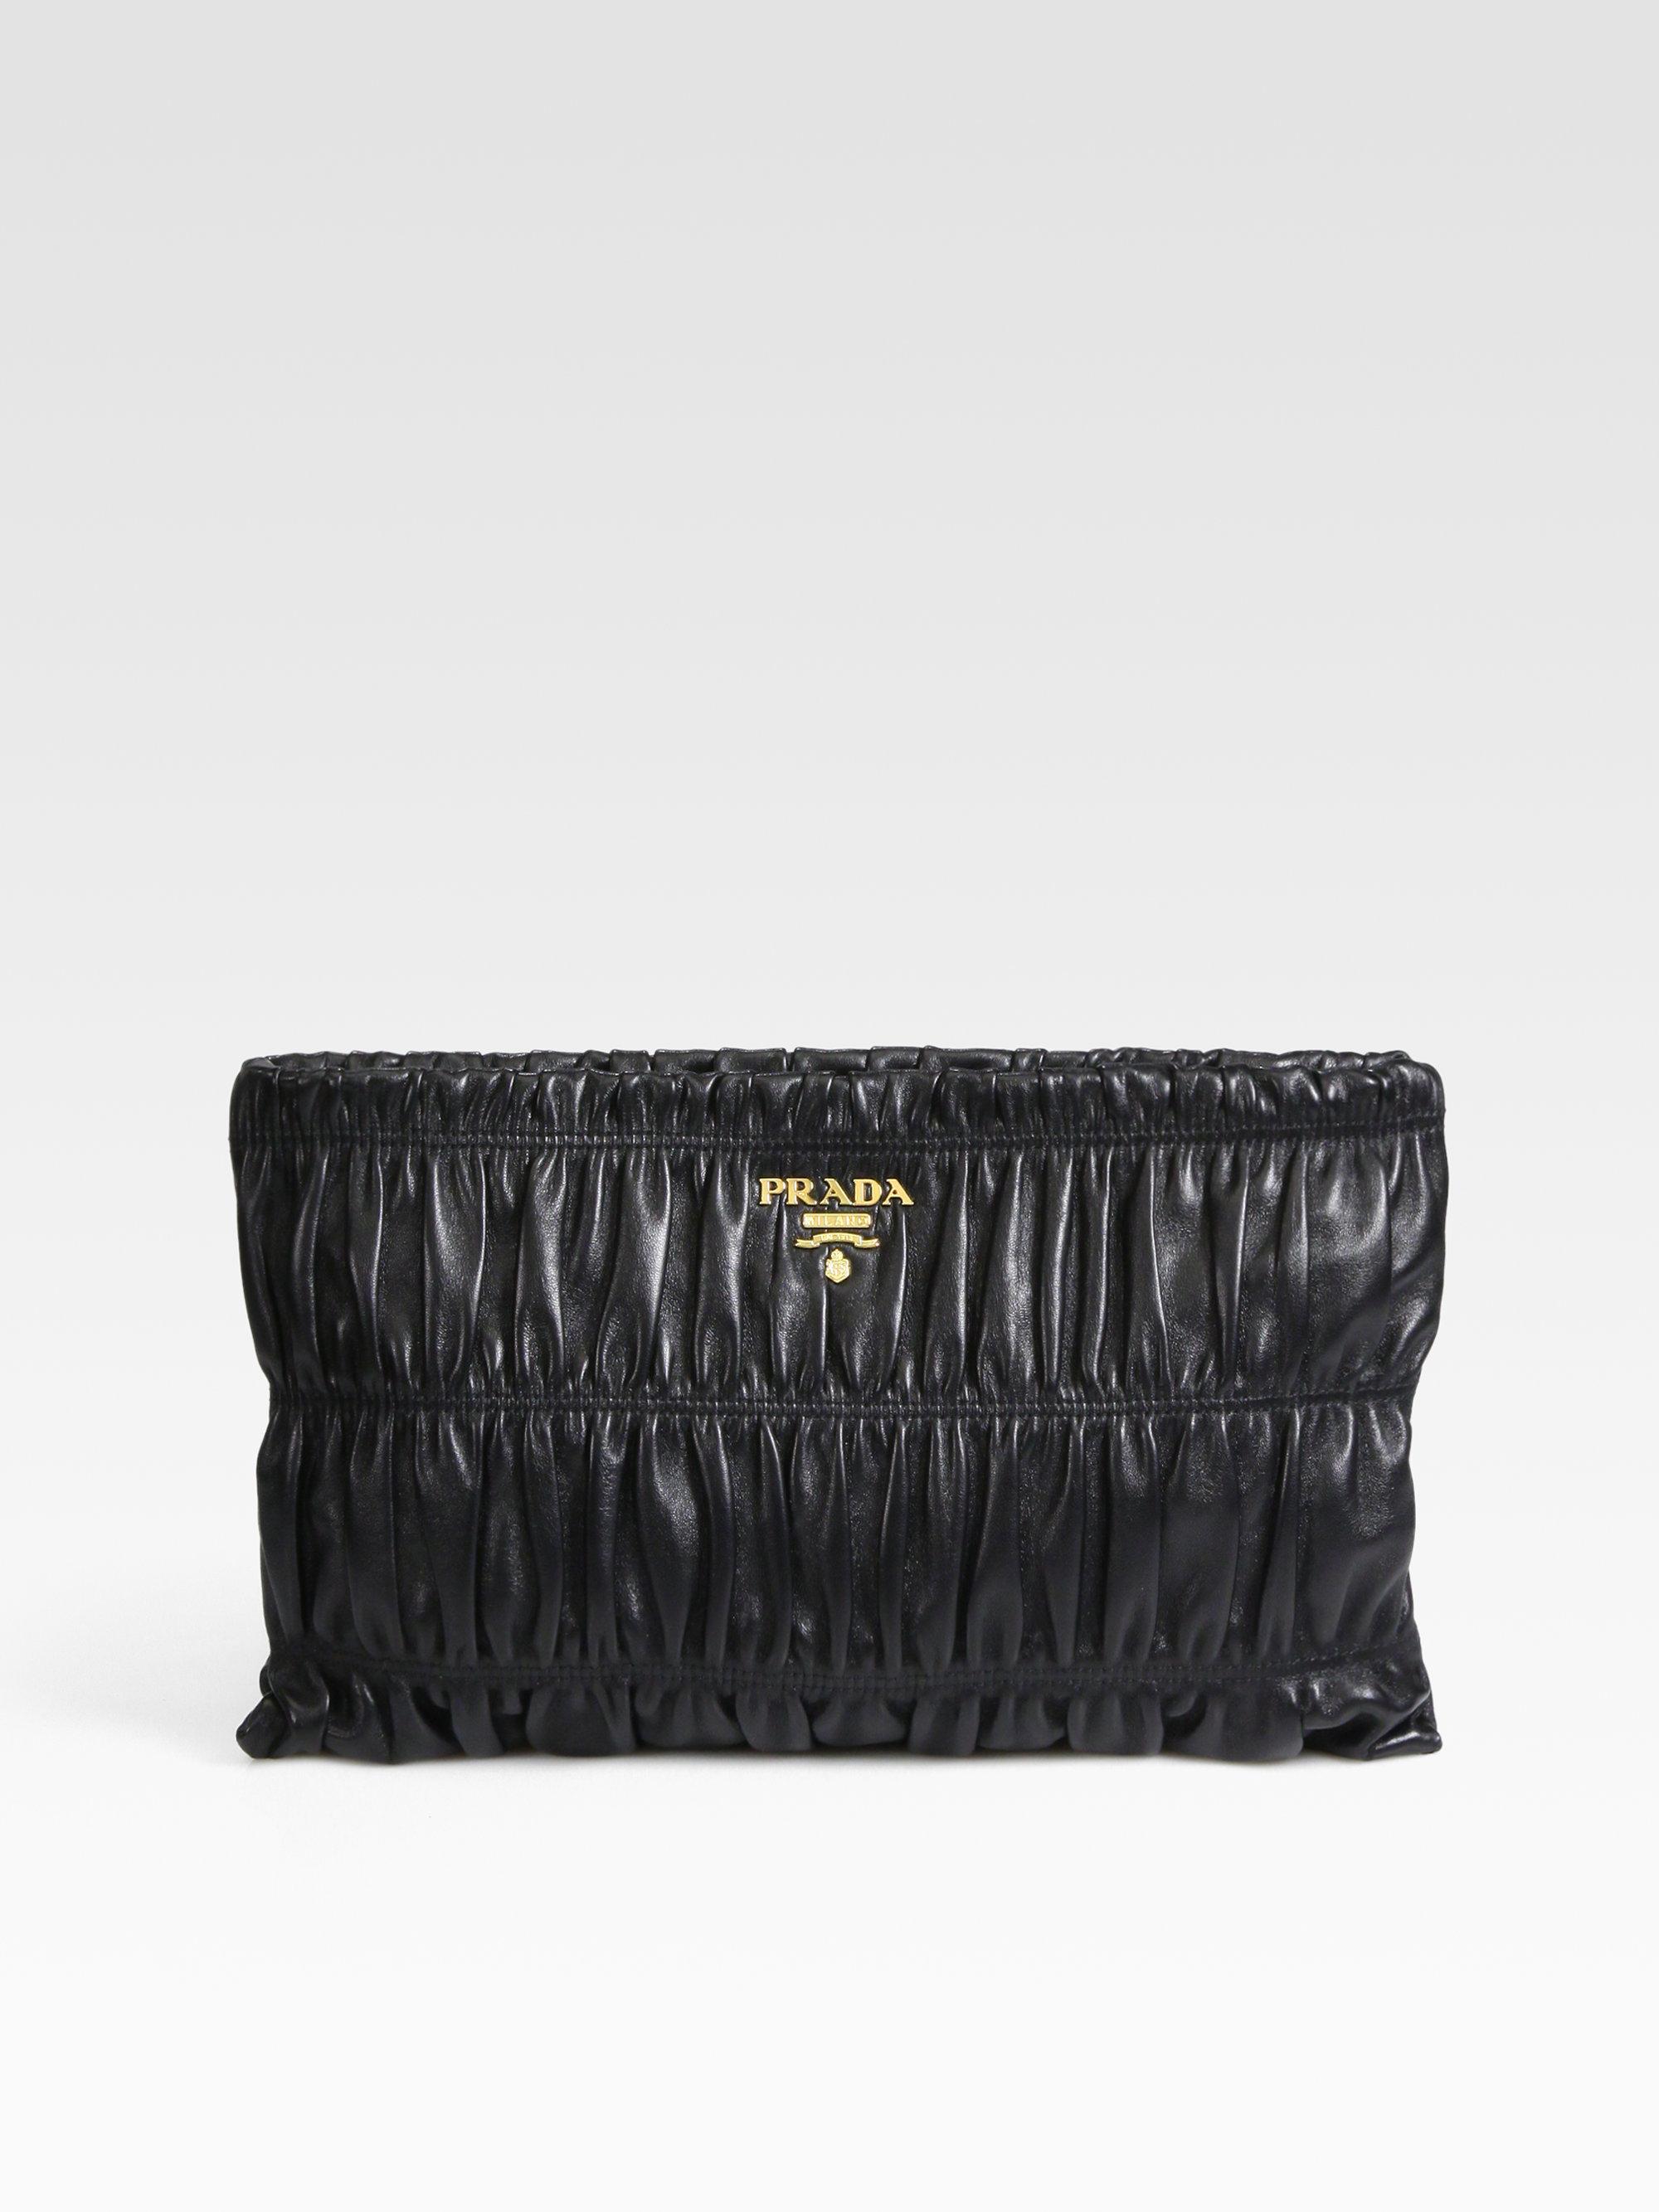 small prada bag - Prada Nappa Gaufre Large Clutch in Black (nero-black) | Lyst